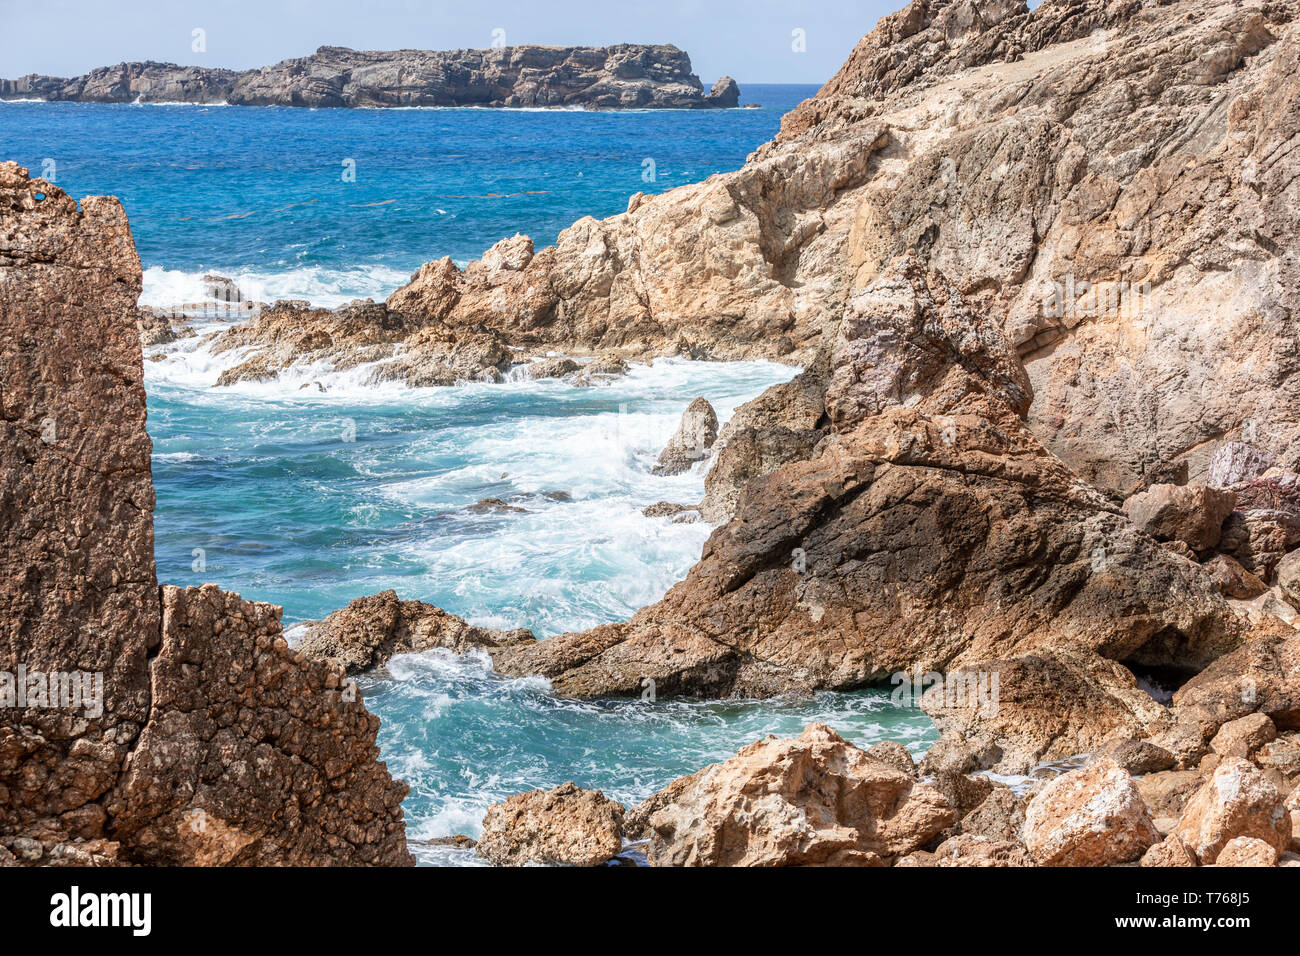 Rugged coast line of Grand Fond, St Barts - Stock Image